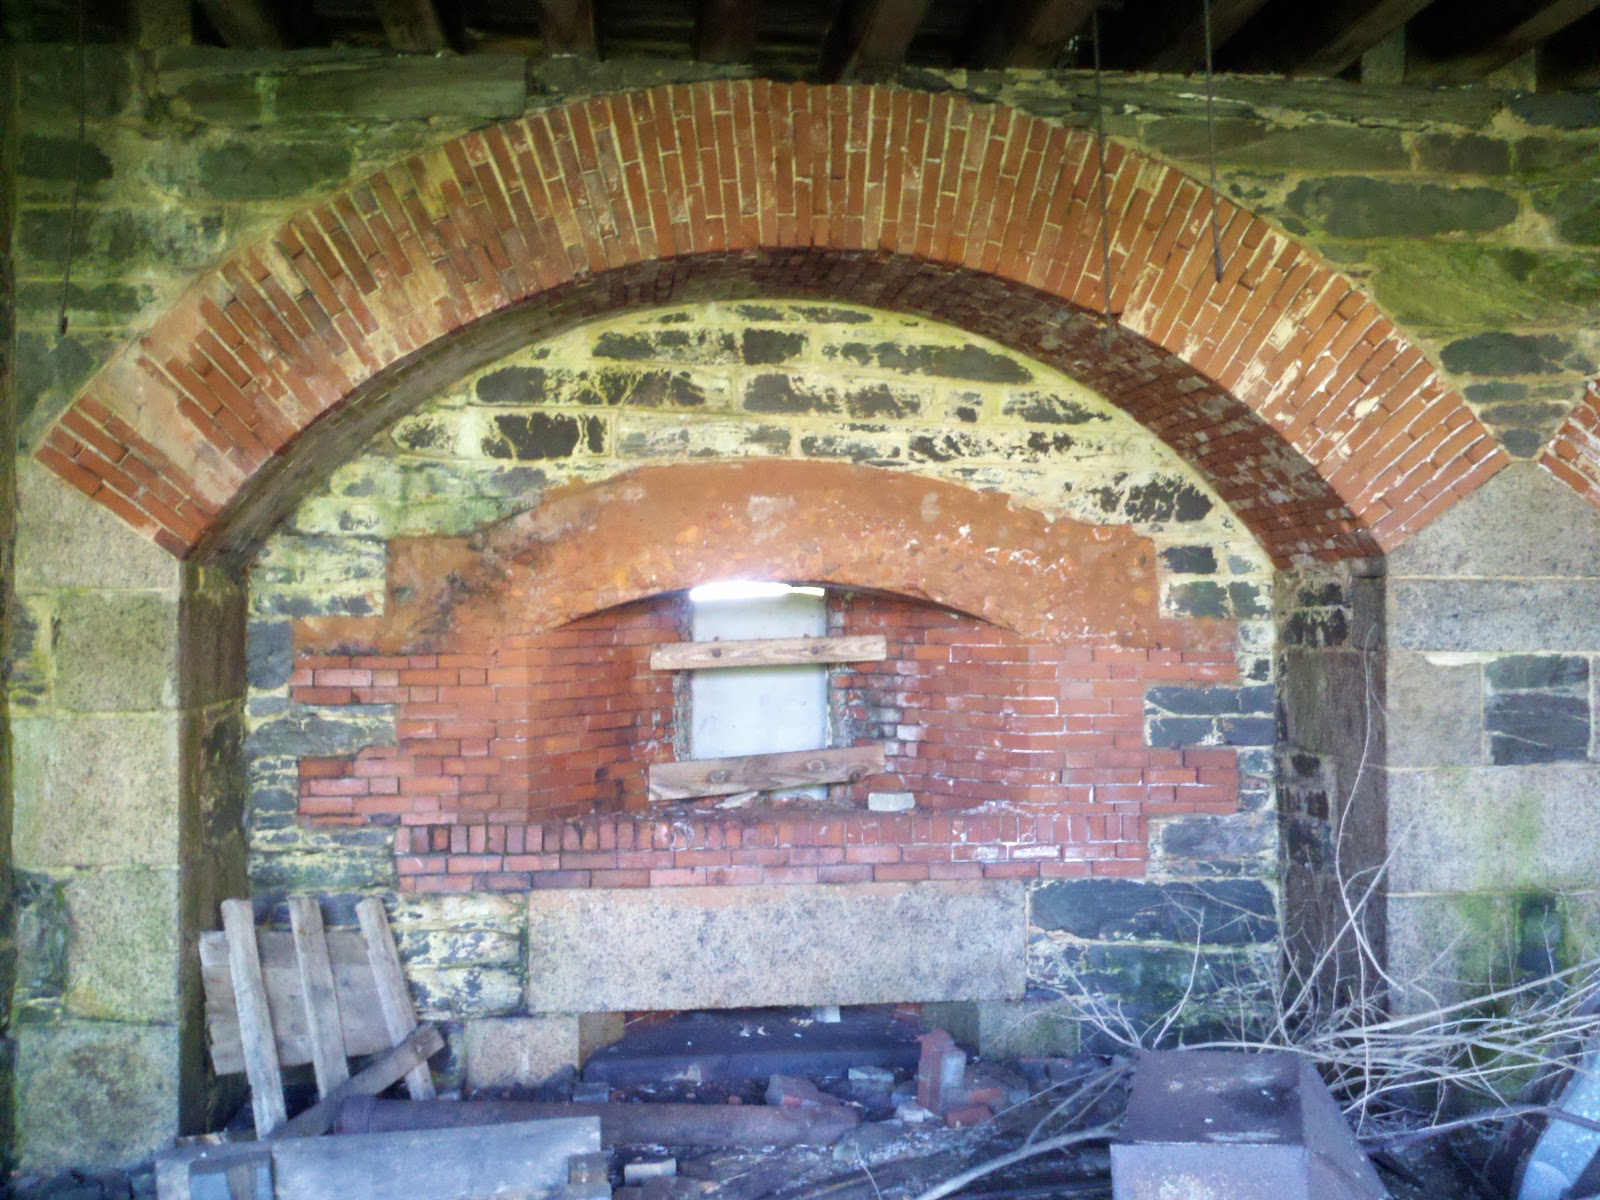 pcls n v i u brick concrete arch fort adams ri